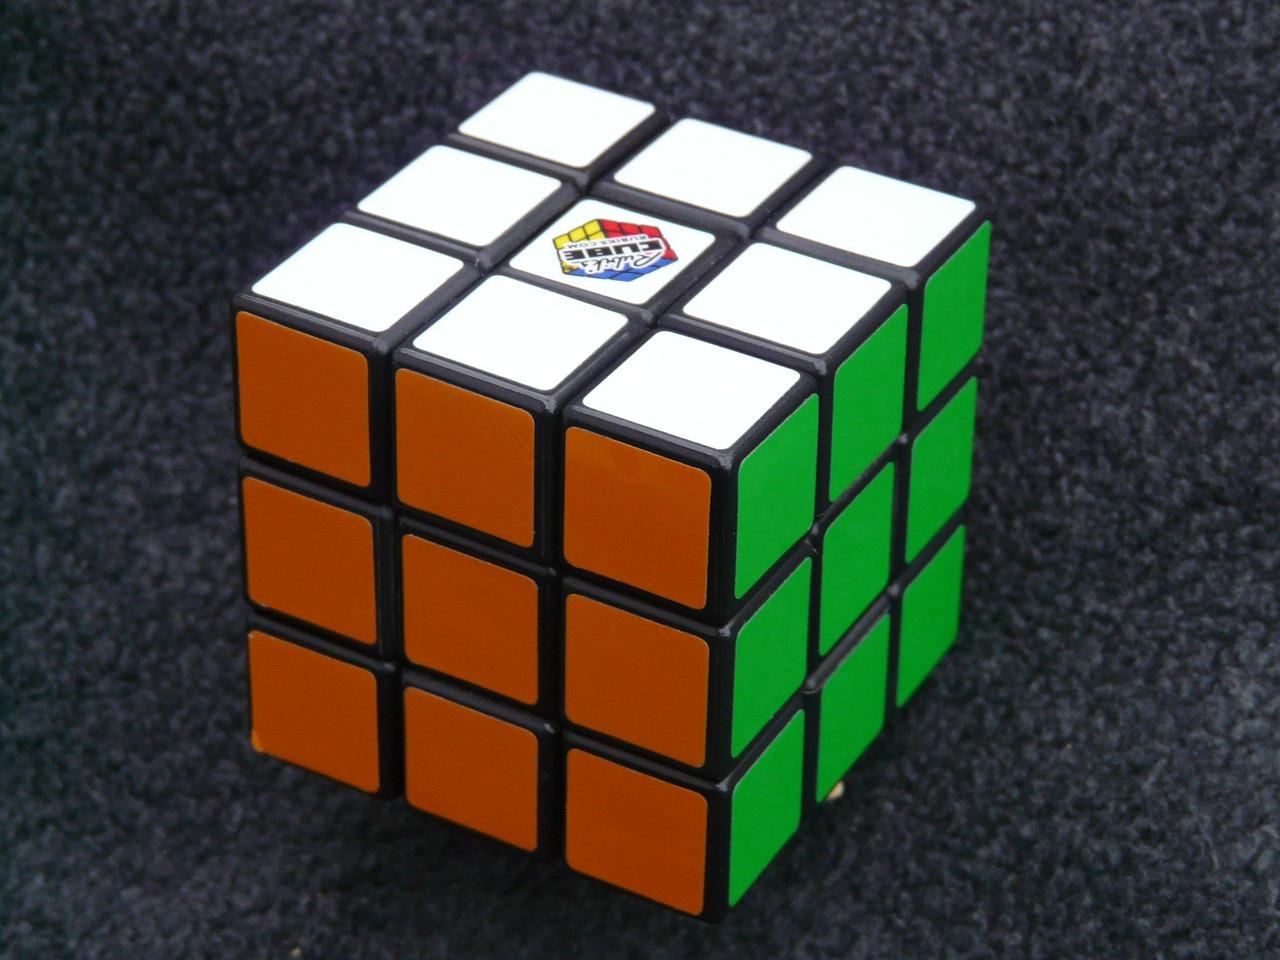 Rubik's kubus kopen